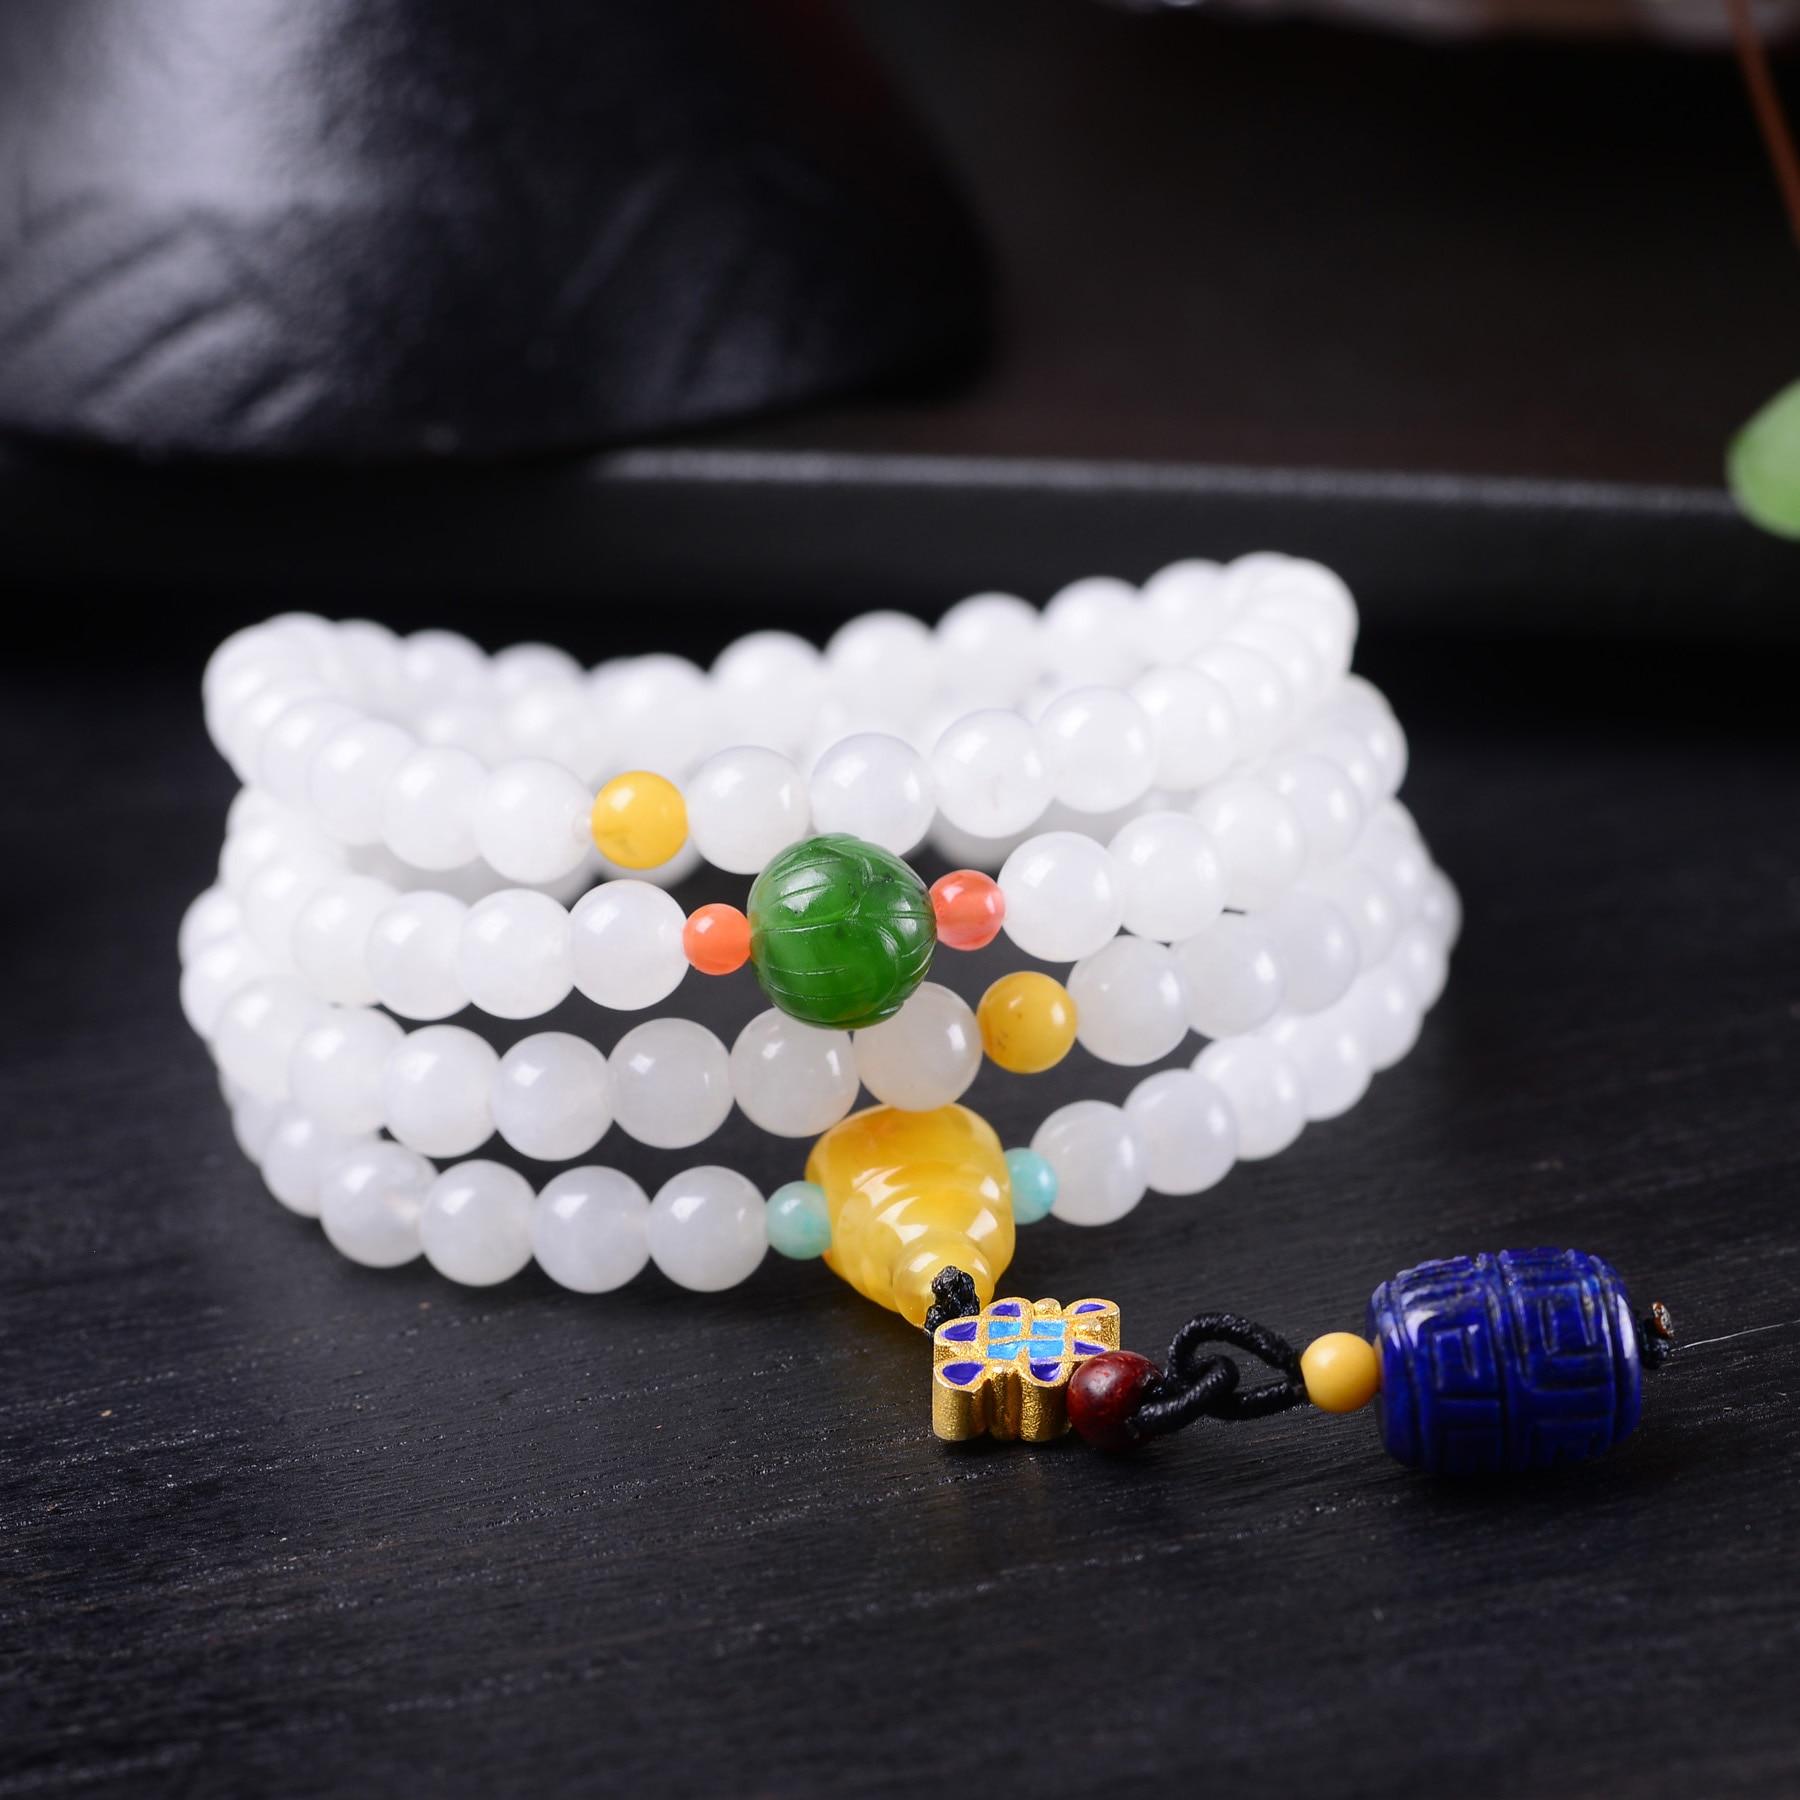 Handmade Authentic Hetian Beads Bracelets 6.5mm handmade authentic hetian crystal budda bracelets